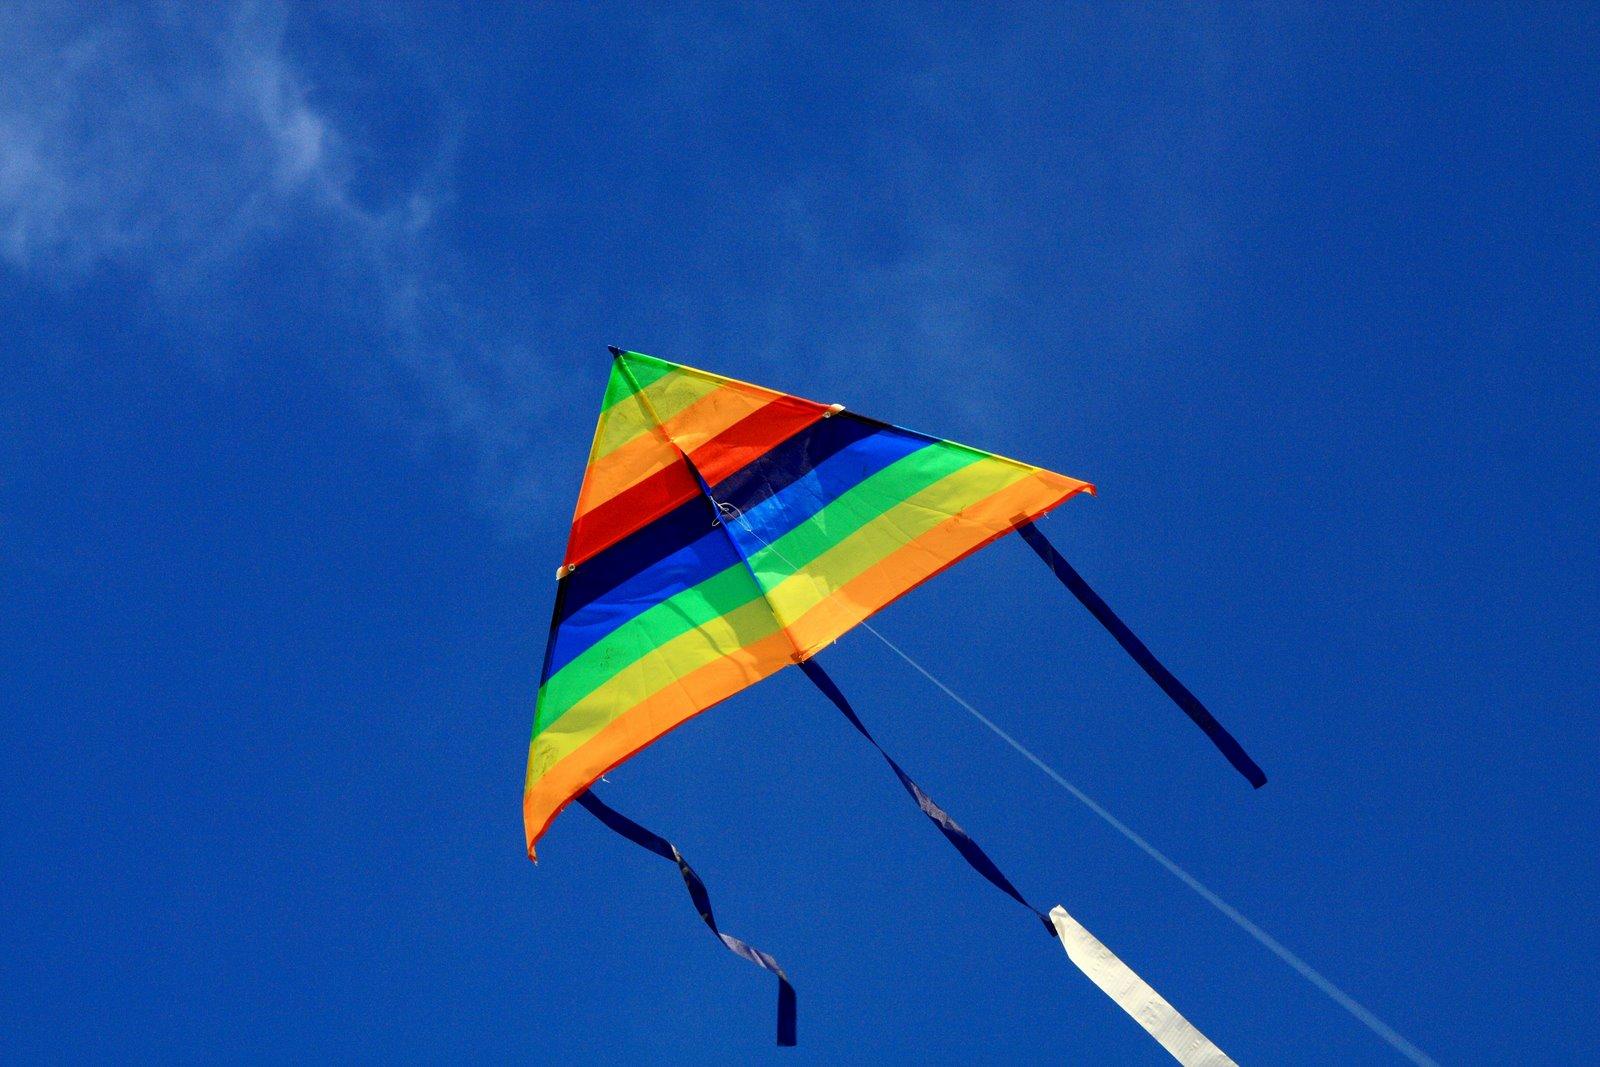 [kite]